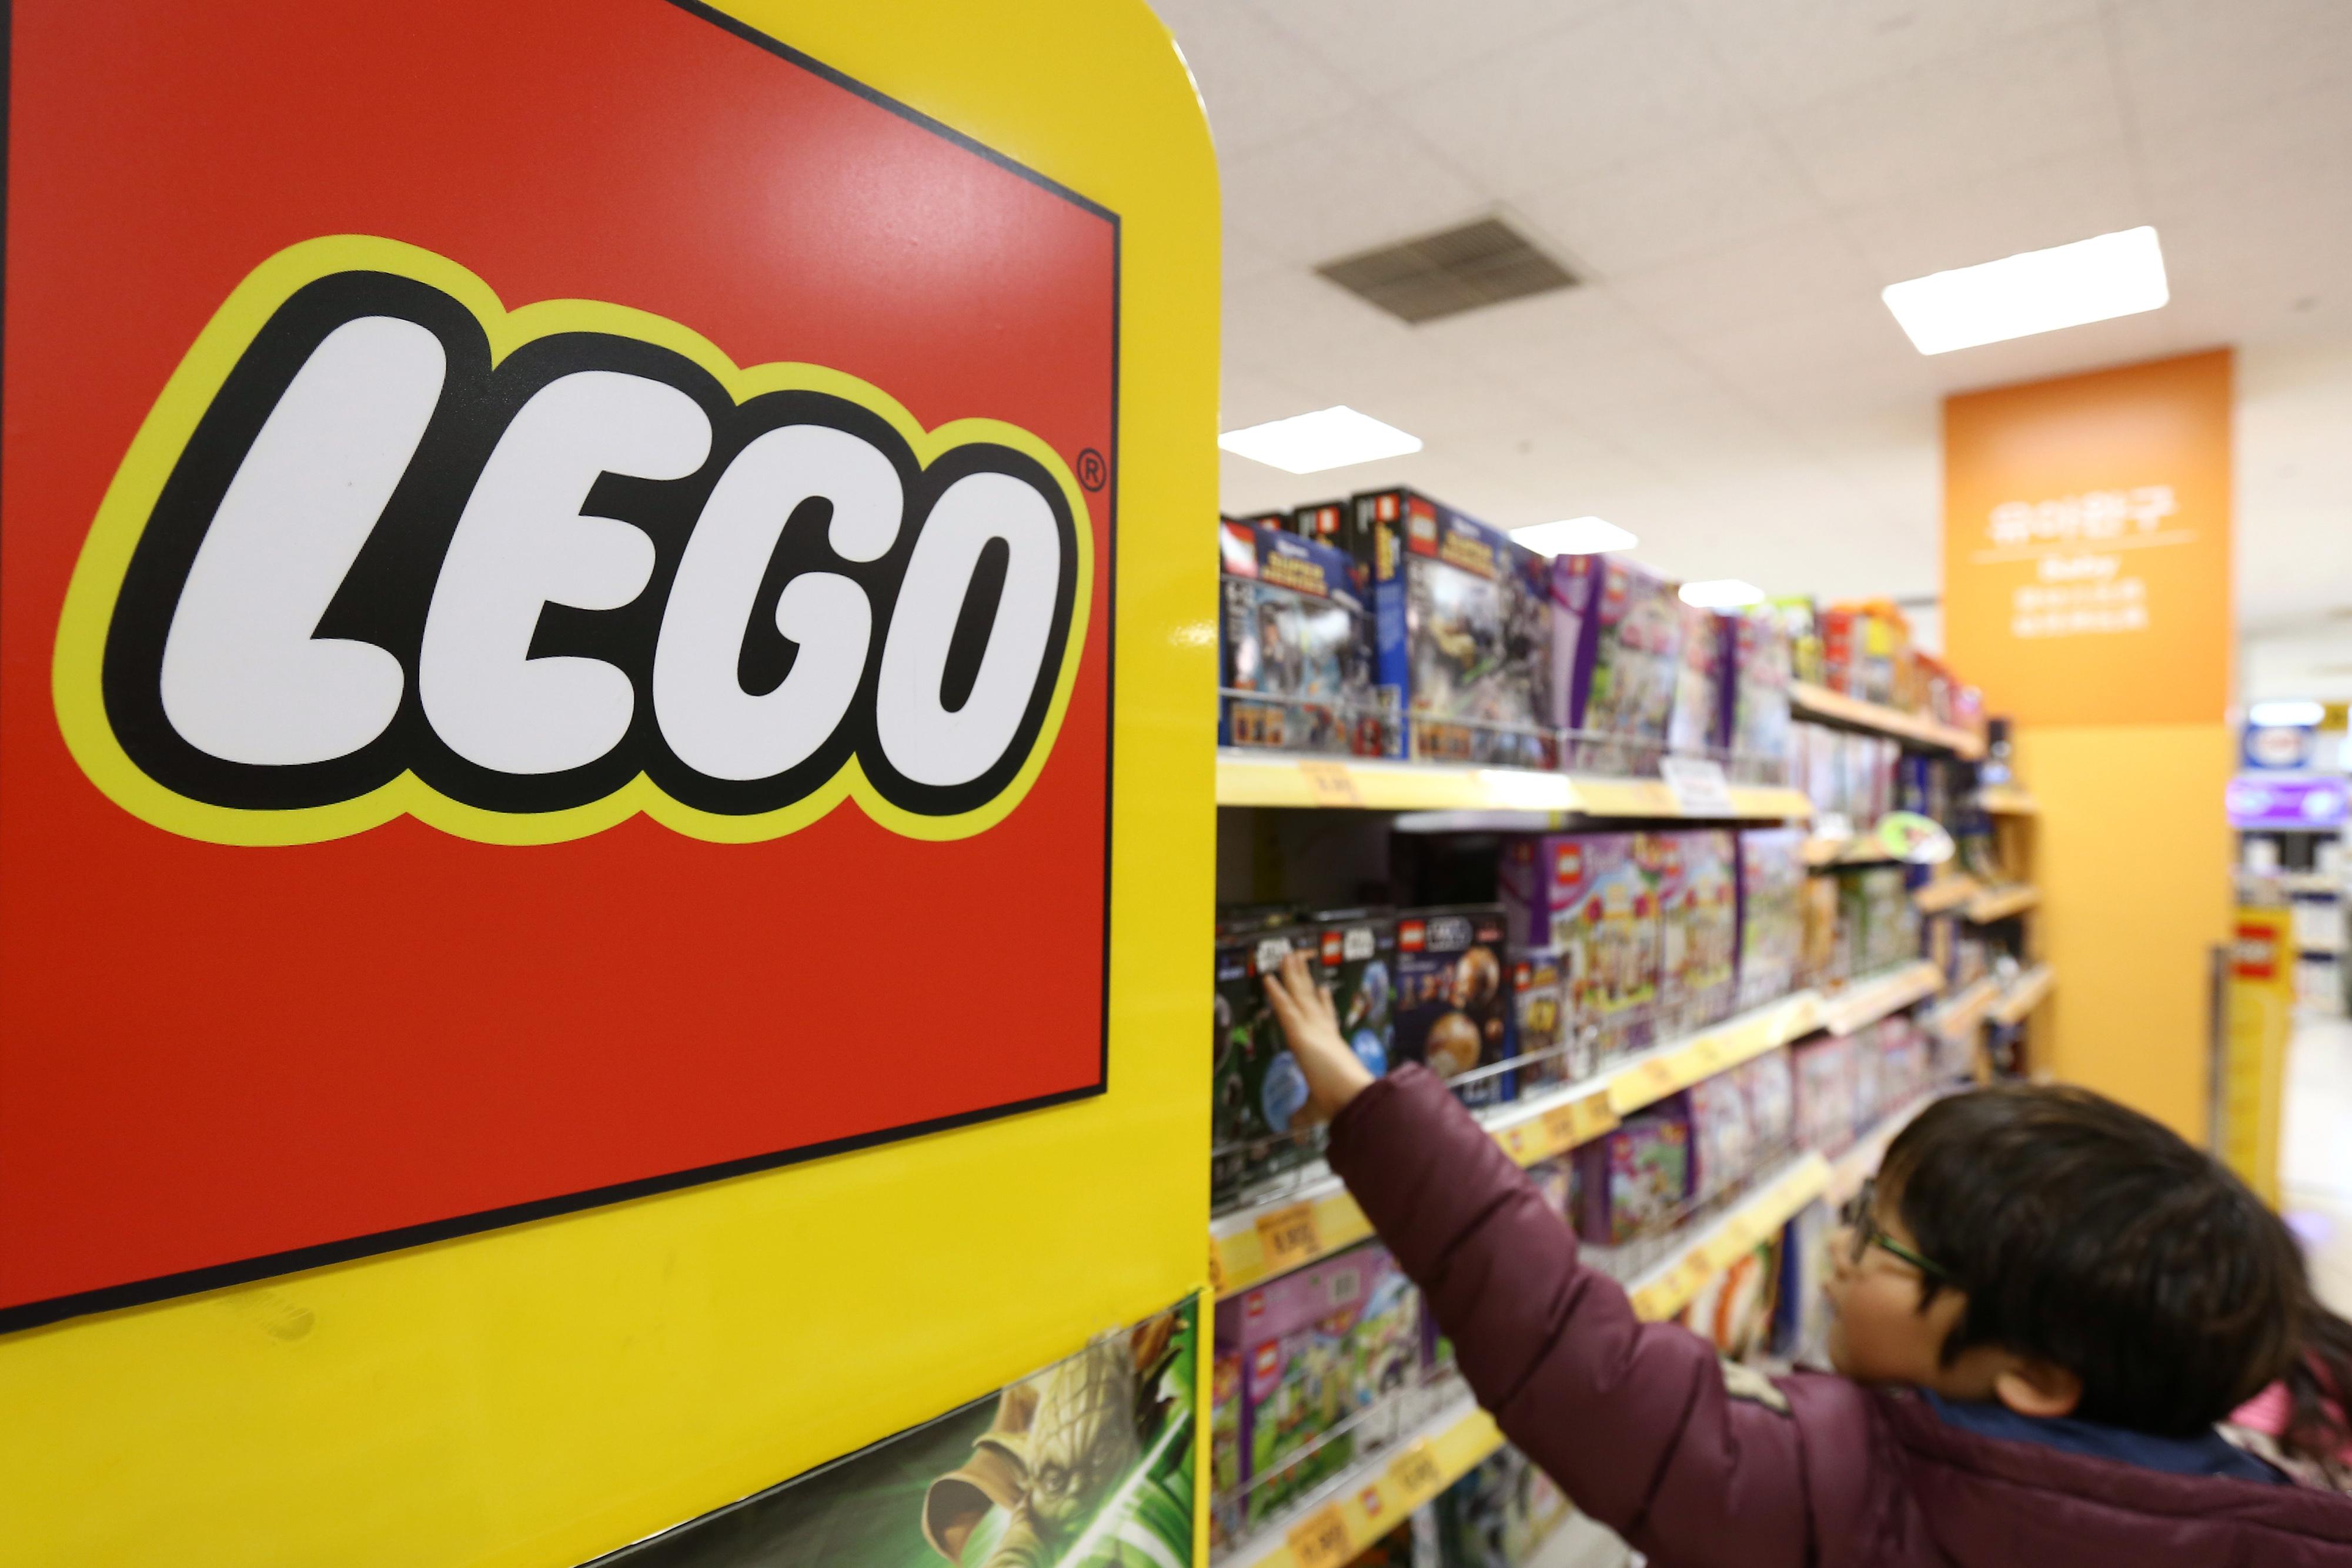 Inside A Shinsegae Co. E-Mart Store Ahead Of Consumer Confidence Data